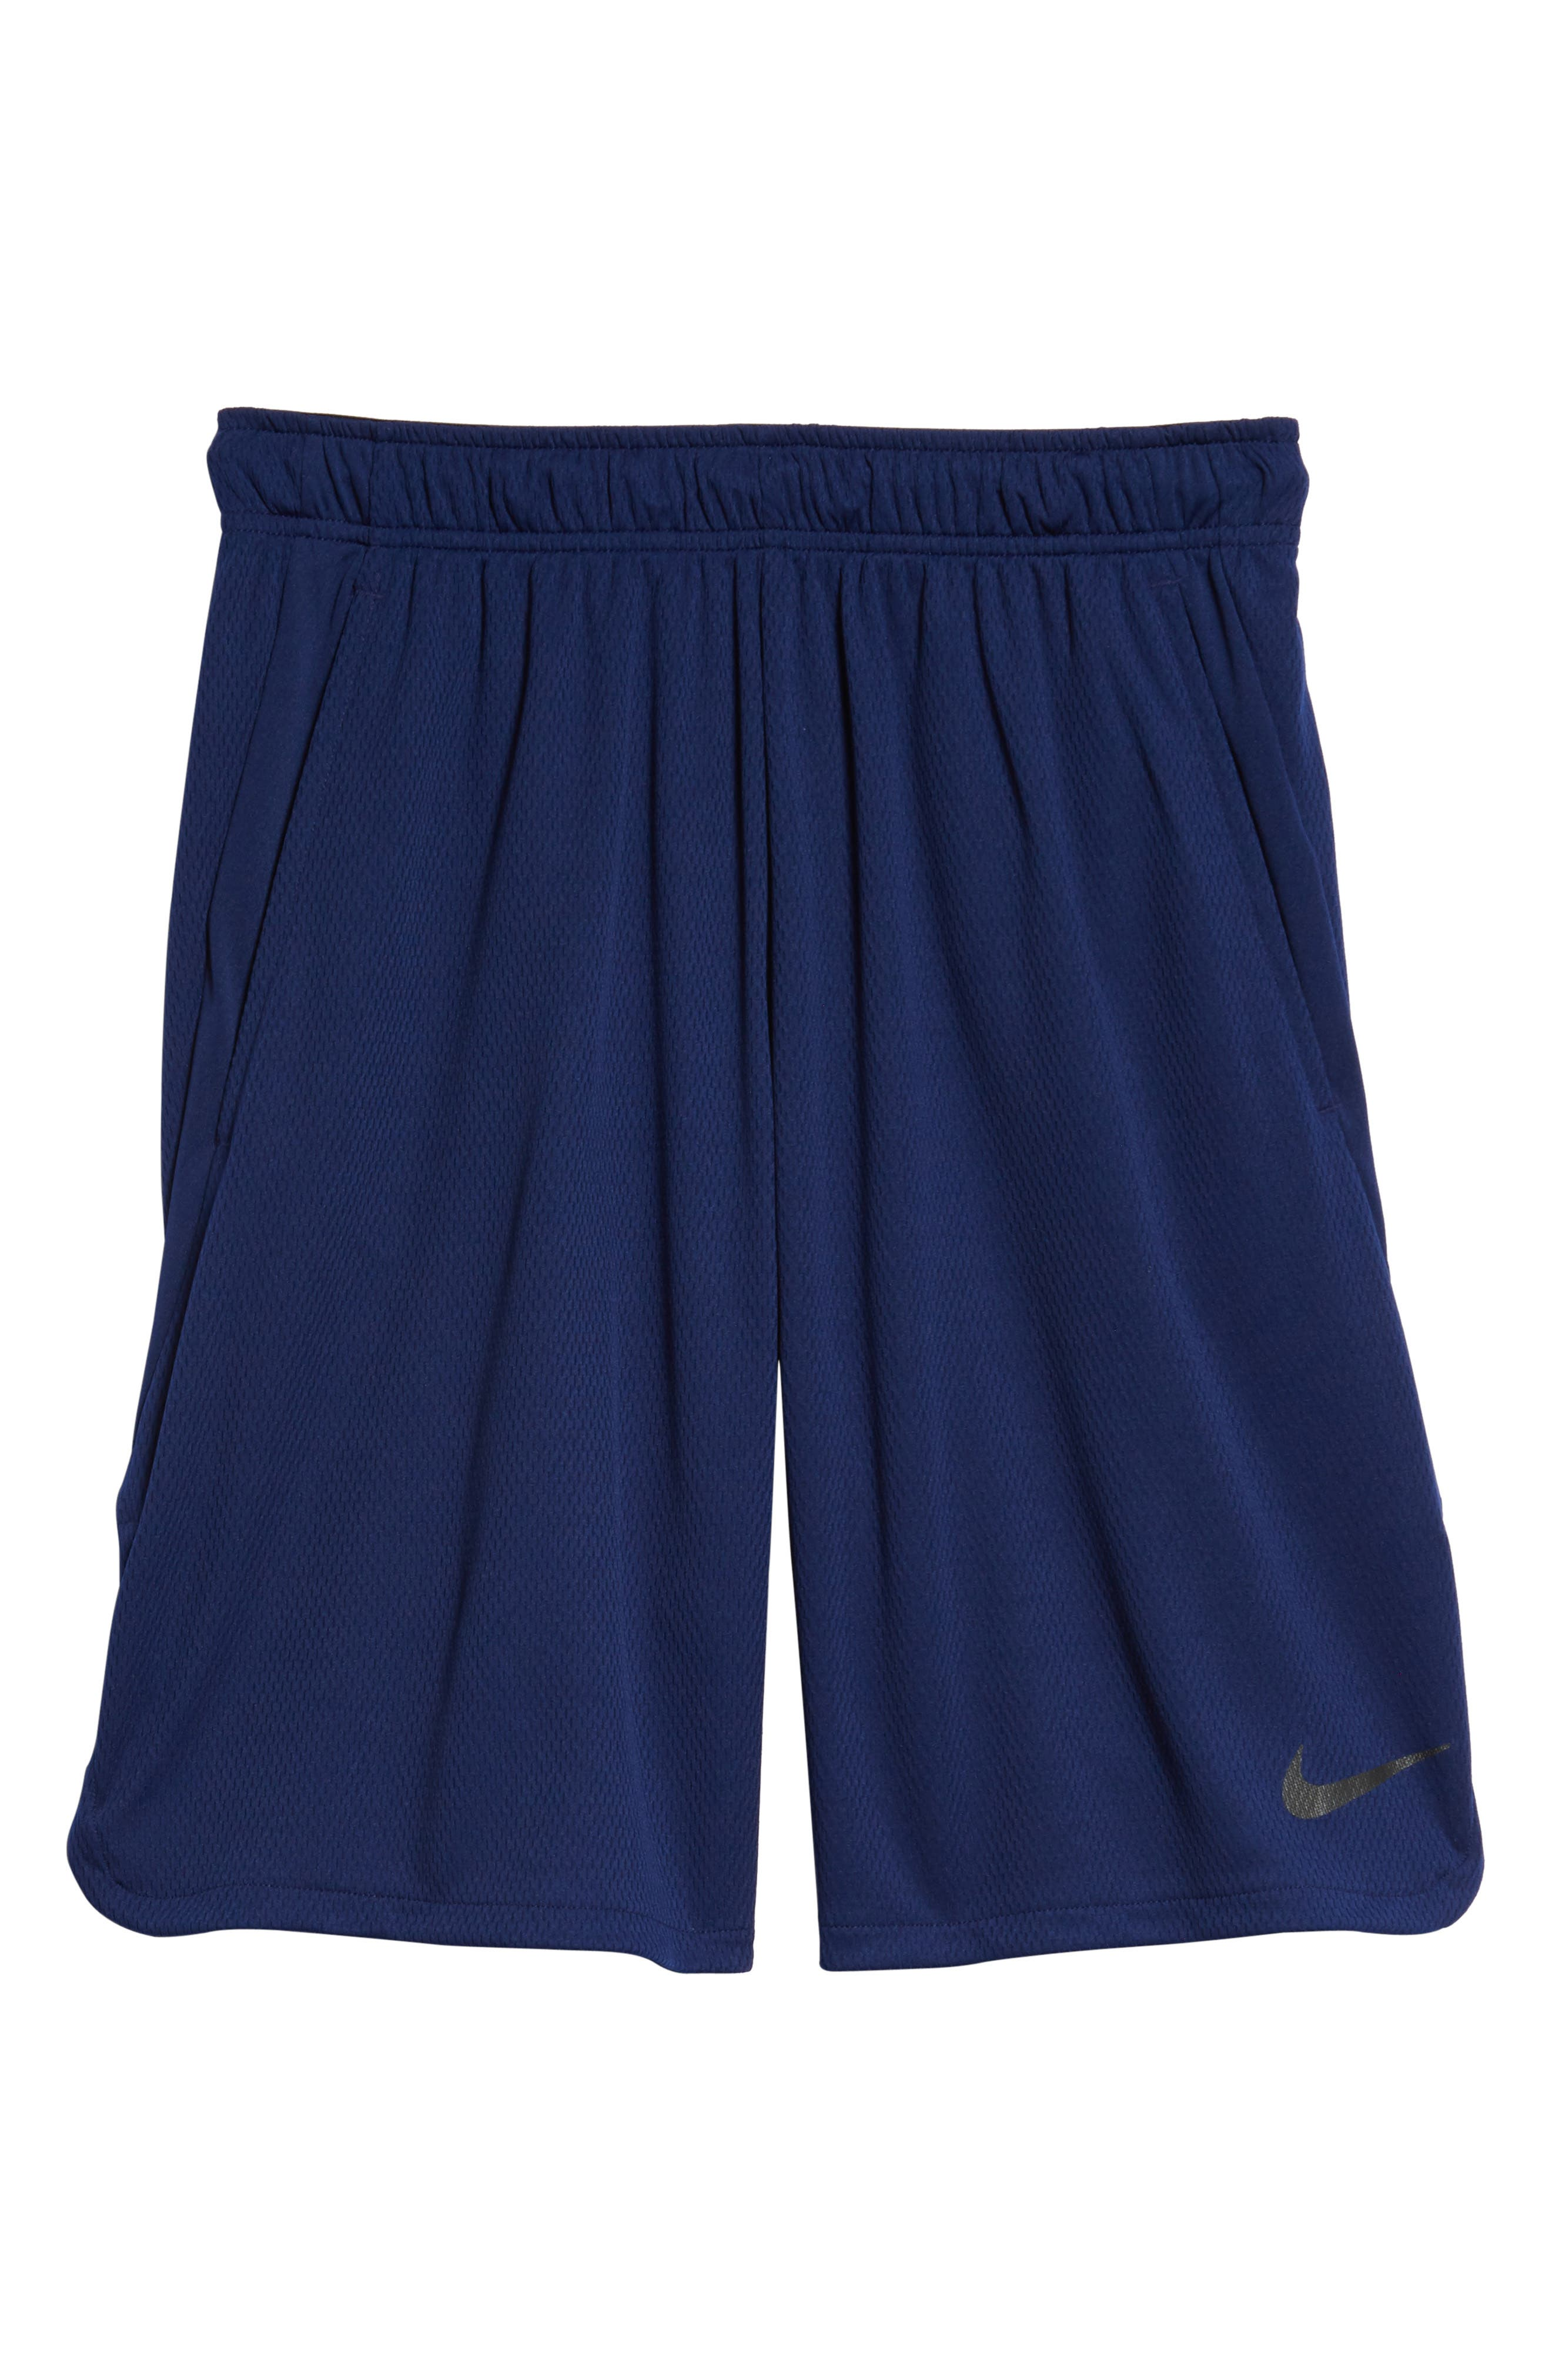 Training Dry 4.0 Shorts,                             Alternate thumbnail 34, color,